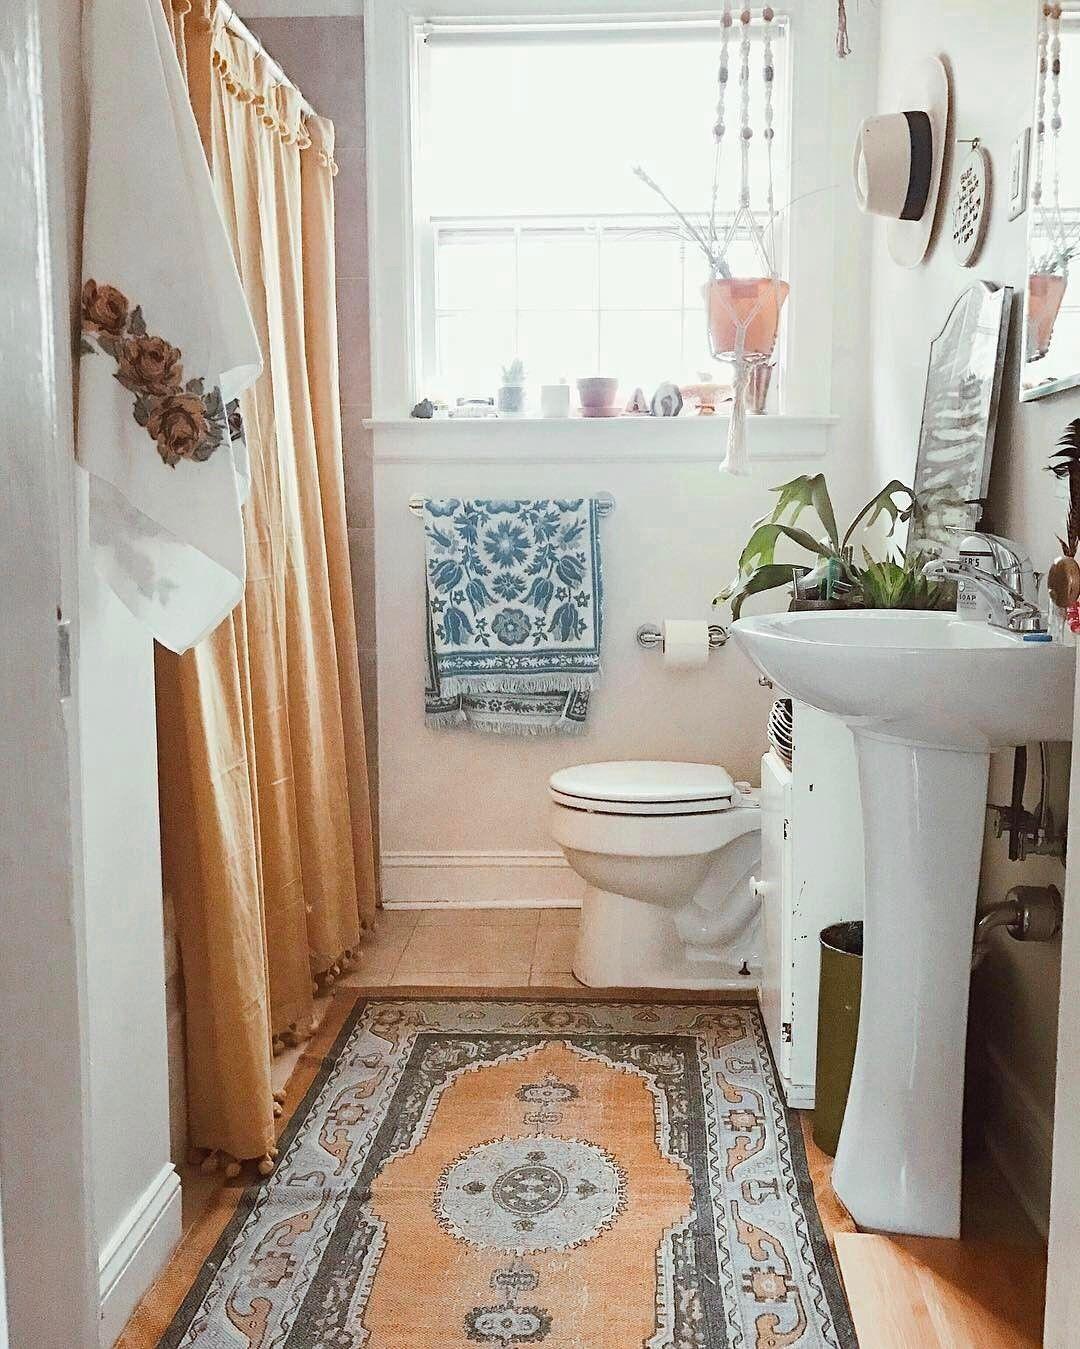 Boho Bathroom Urban Outfitters Urbanoutfitters On Instagram Sunday Am Views Via Lea Cute Bathroom Ideas Small Bathroom Decor Bathroom Design Small Modern